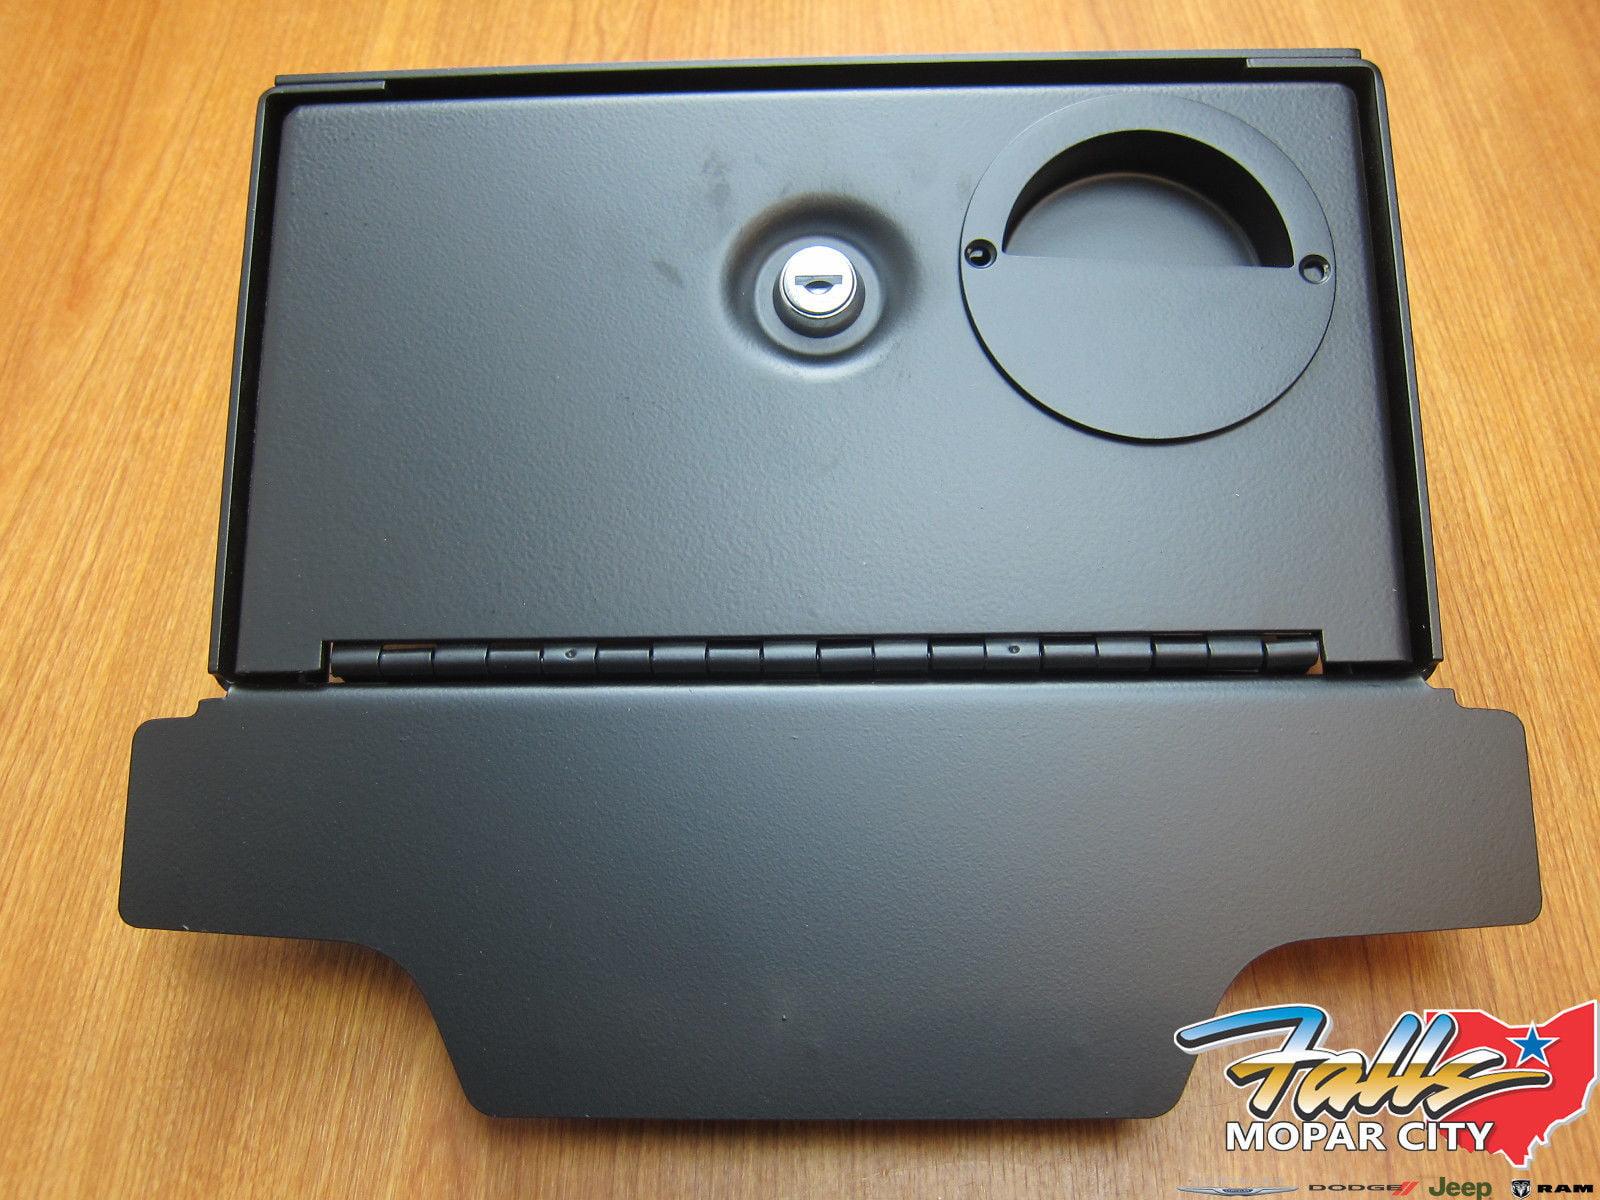 2019 Dodge Ram 1500 Floor Console Storage Lock Kit With